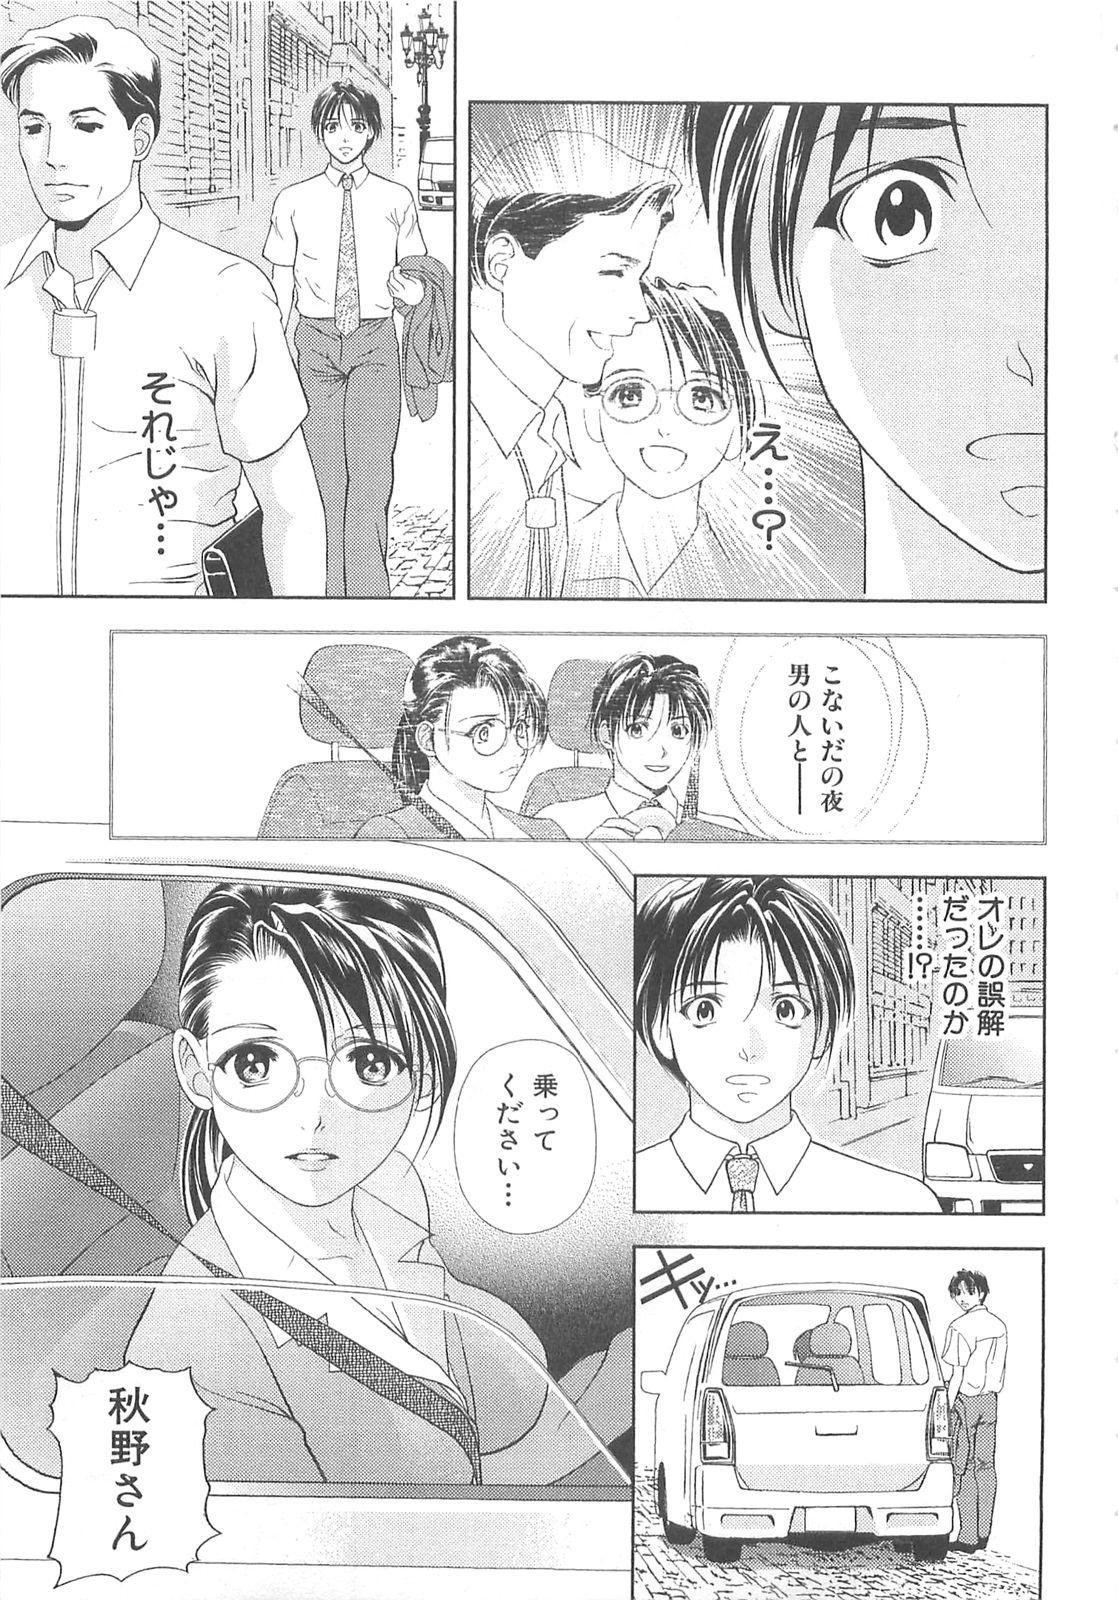 Tenshi no Kyuu - Angel's Pretty Hip 179